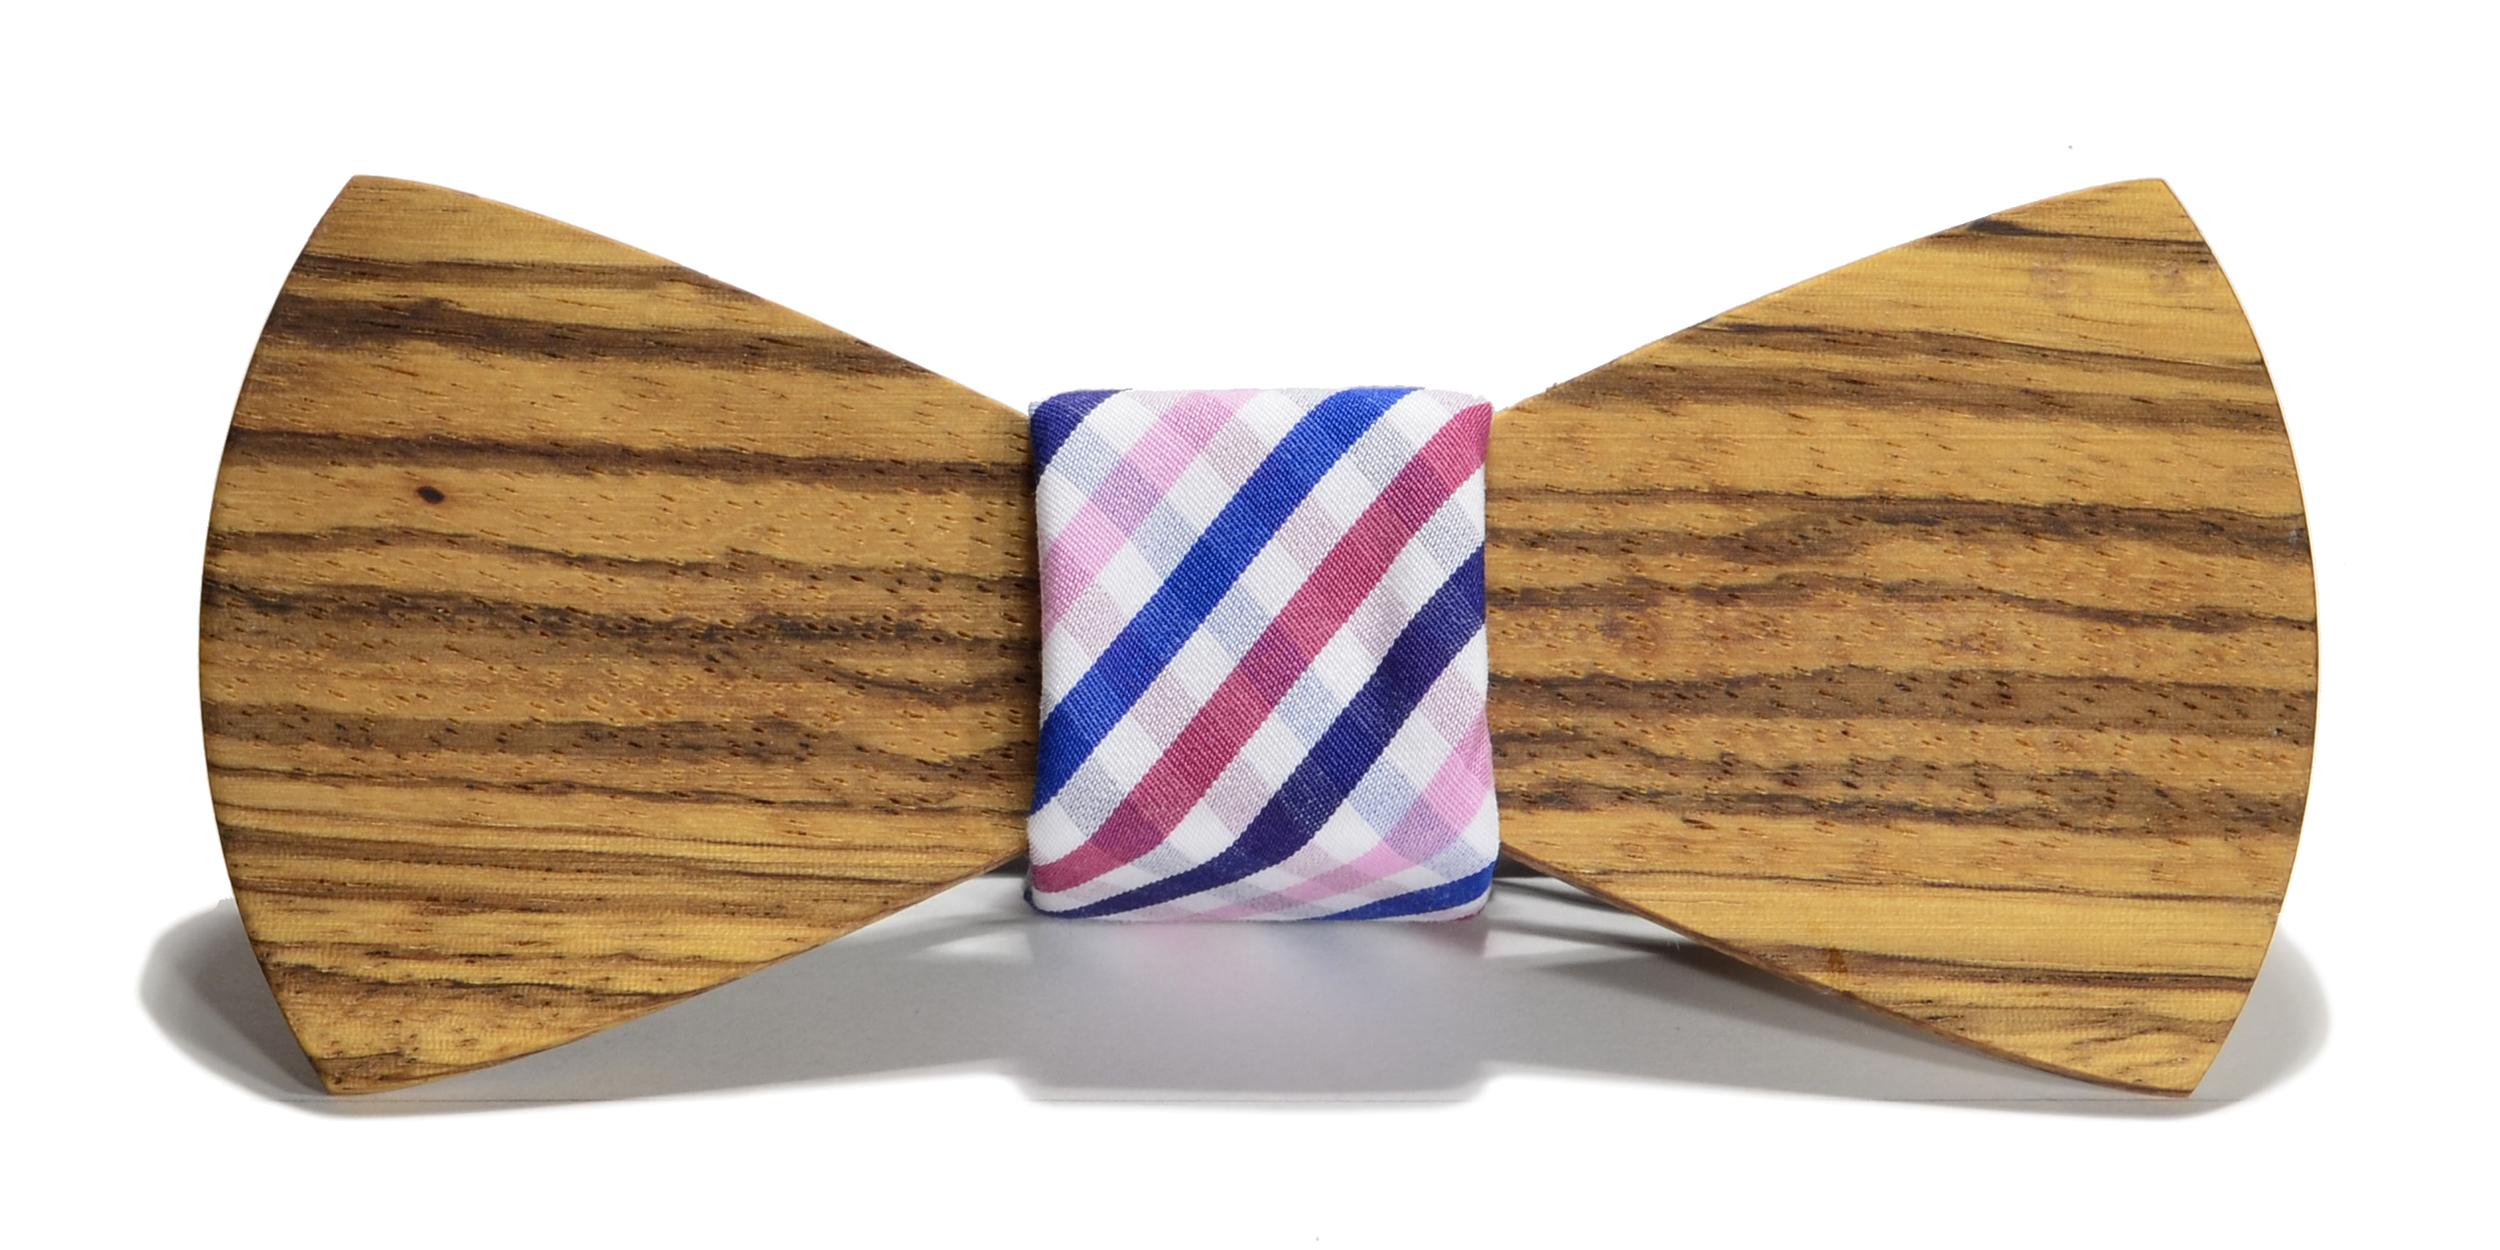 The Bordeaux Zebrawood Traditonal Cotton Wooden Bow Tie